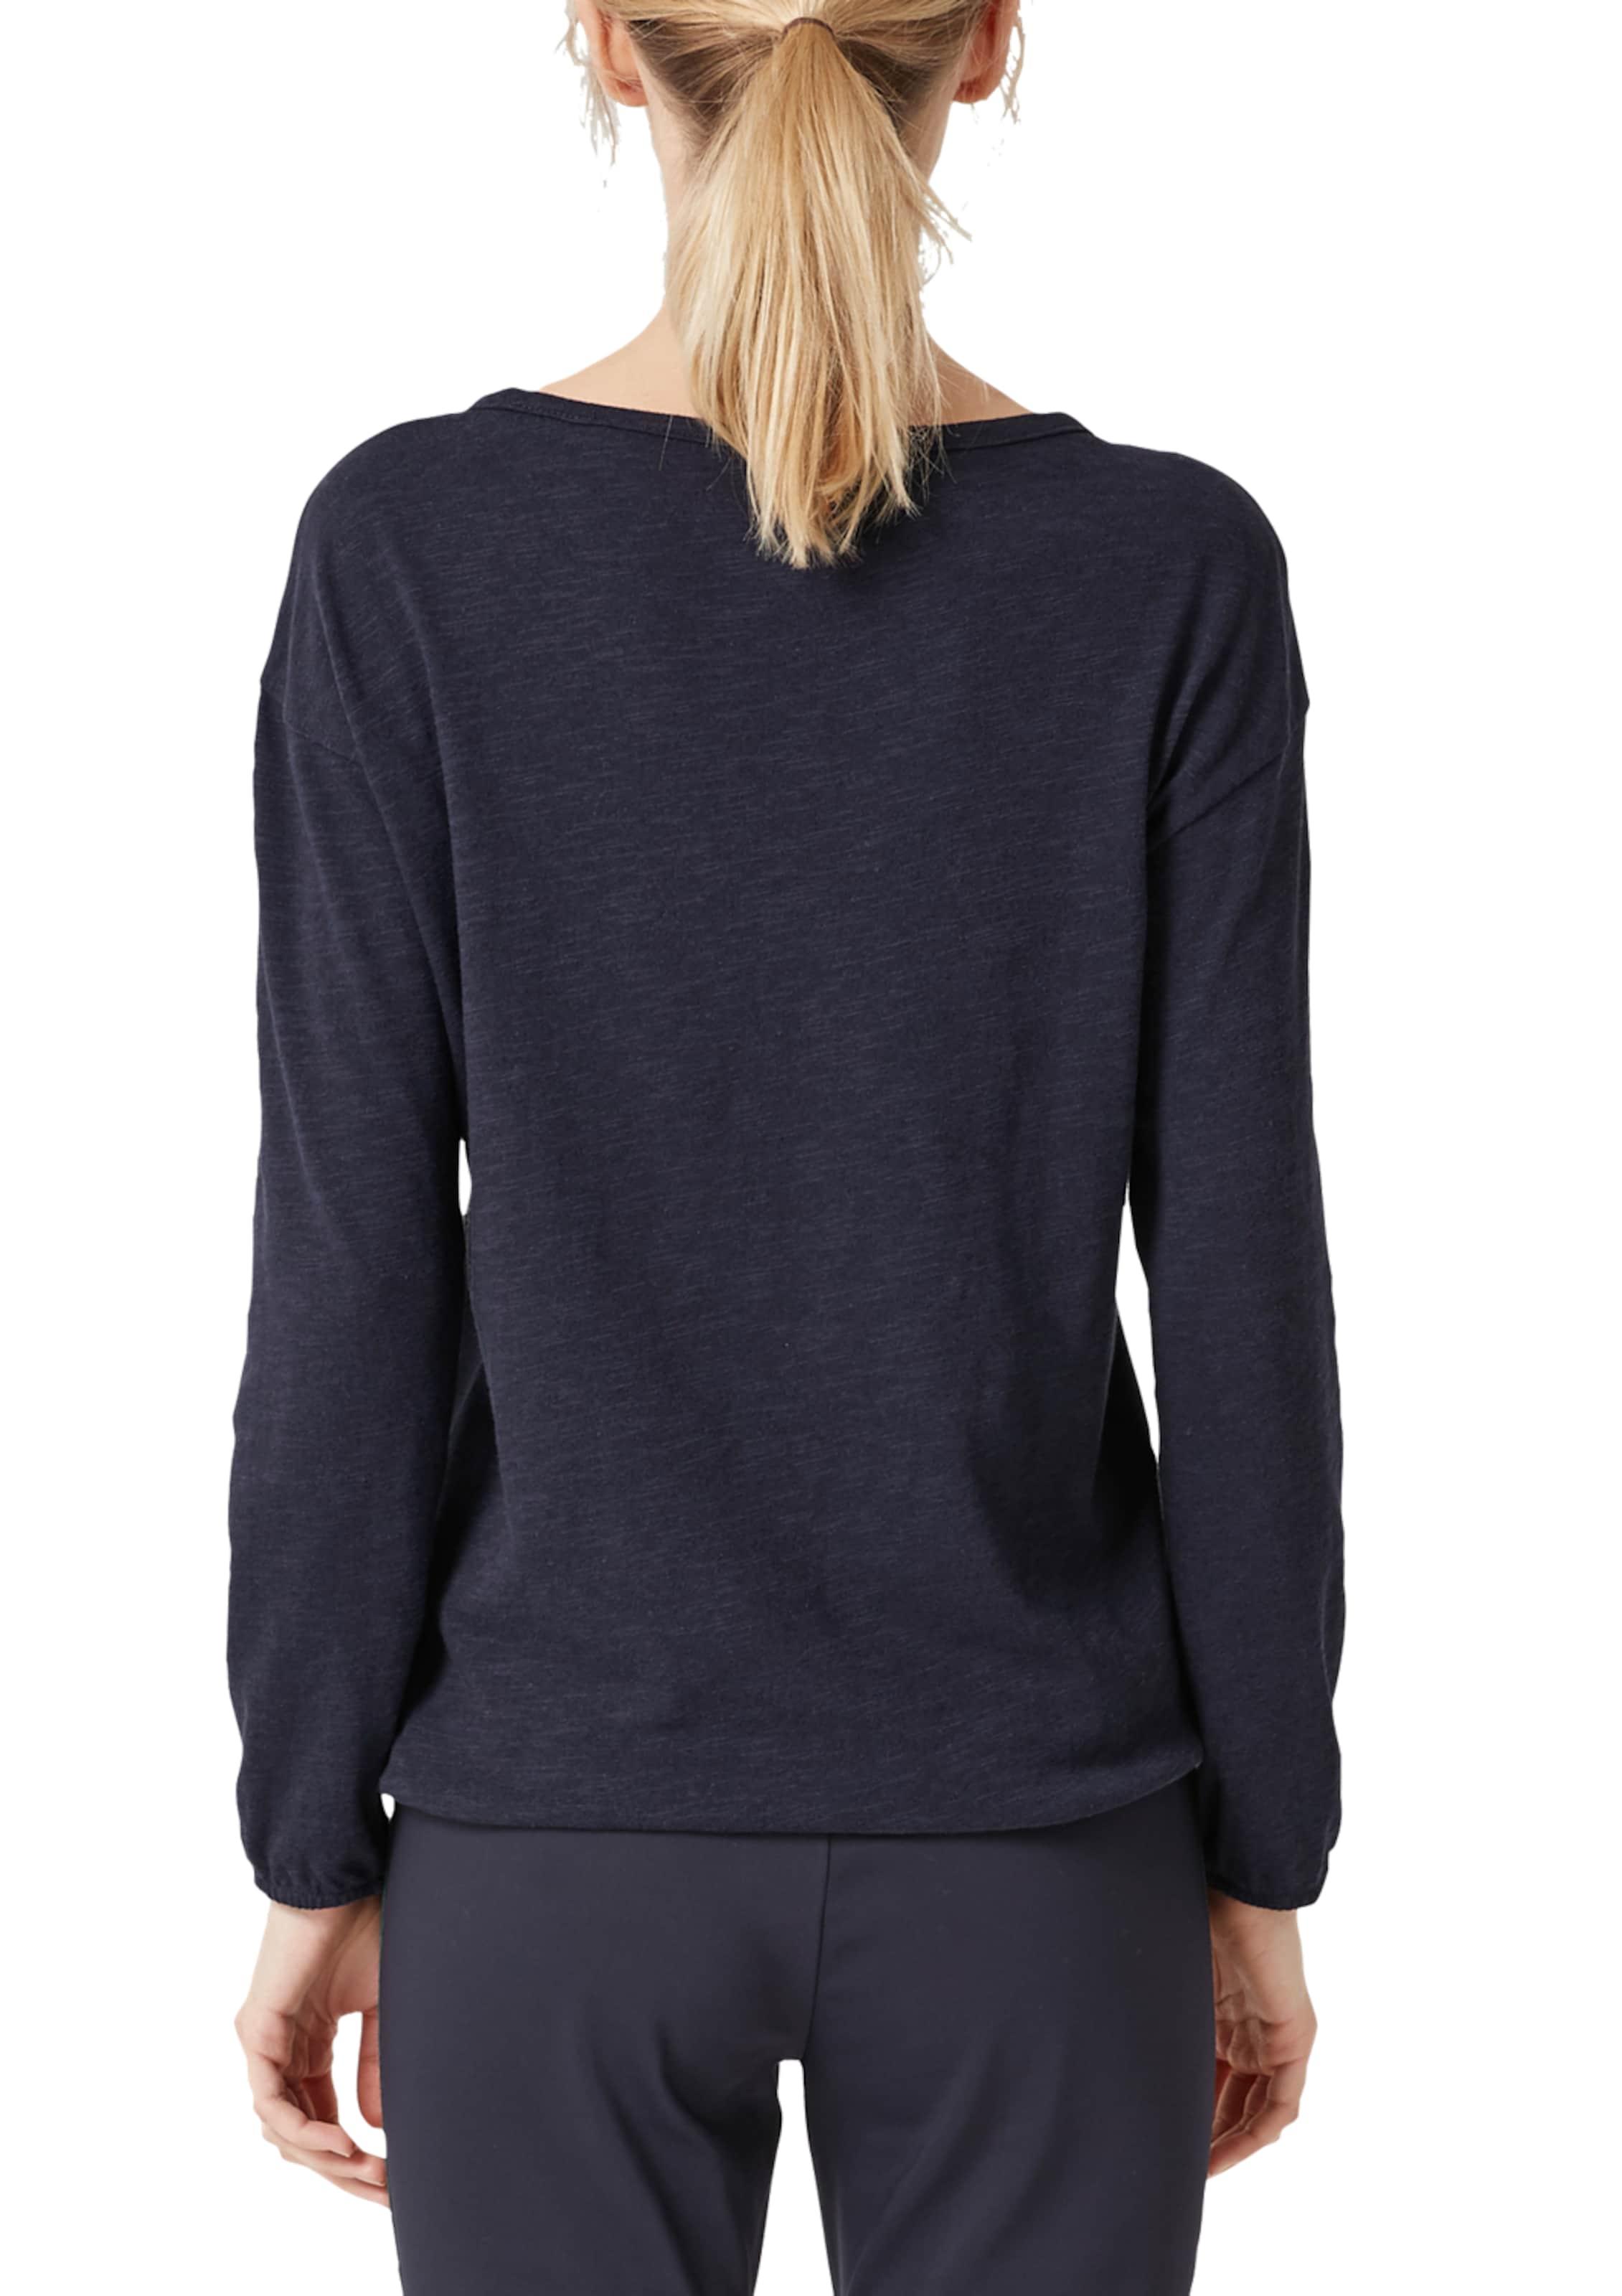 oliver In oliver Shirt In Nachtblau S Nachtblau oliver S Shirt S j354RLqA